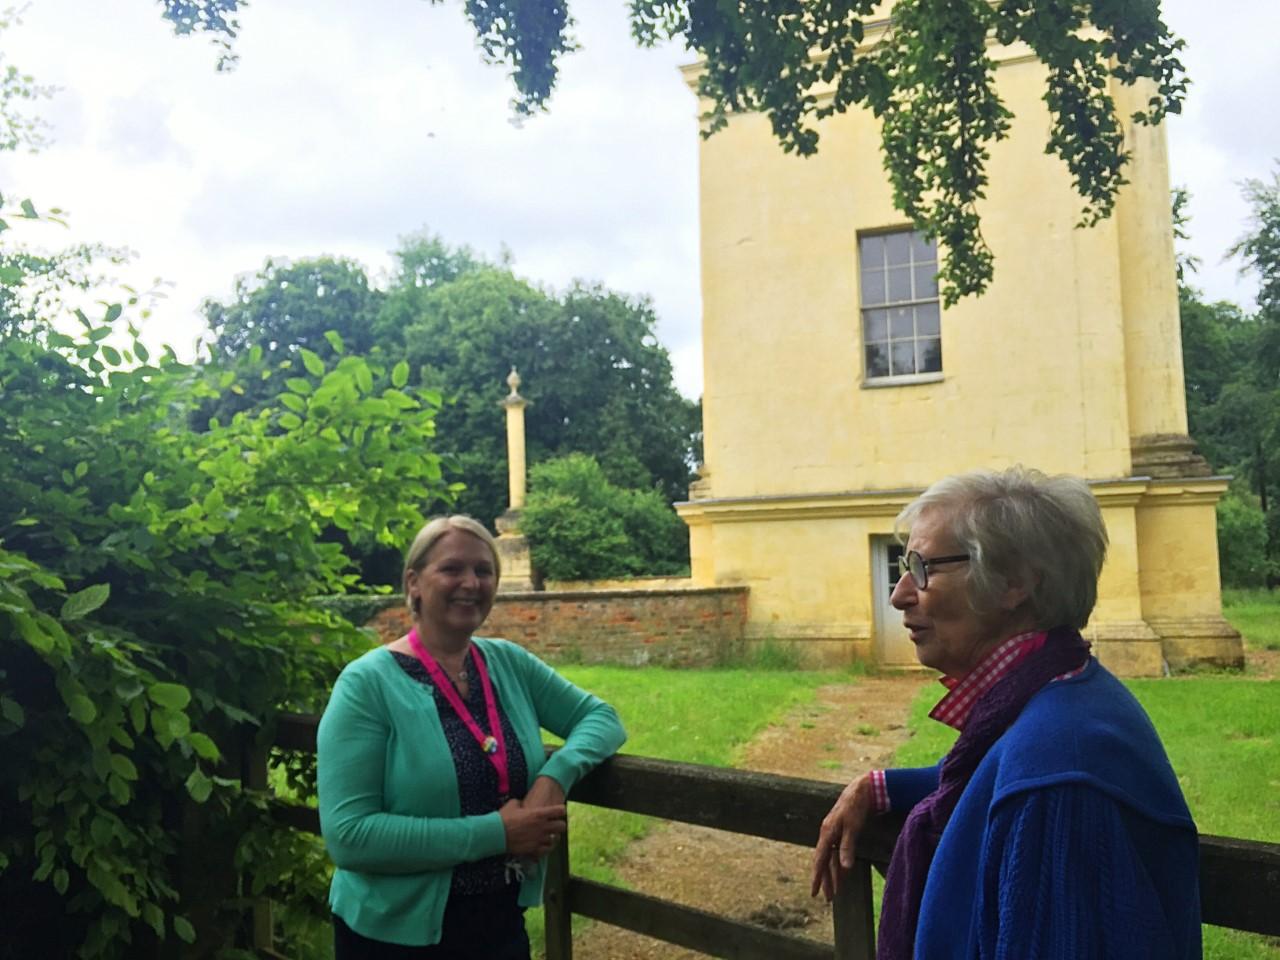 People in Stowe garden